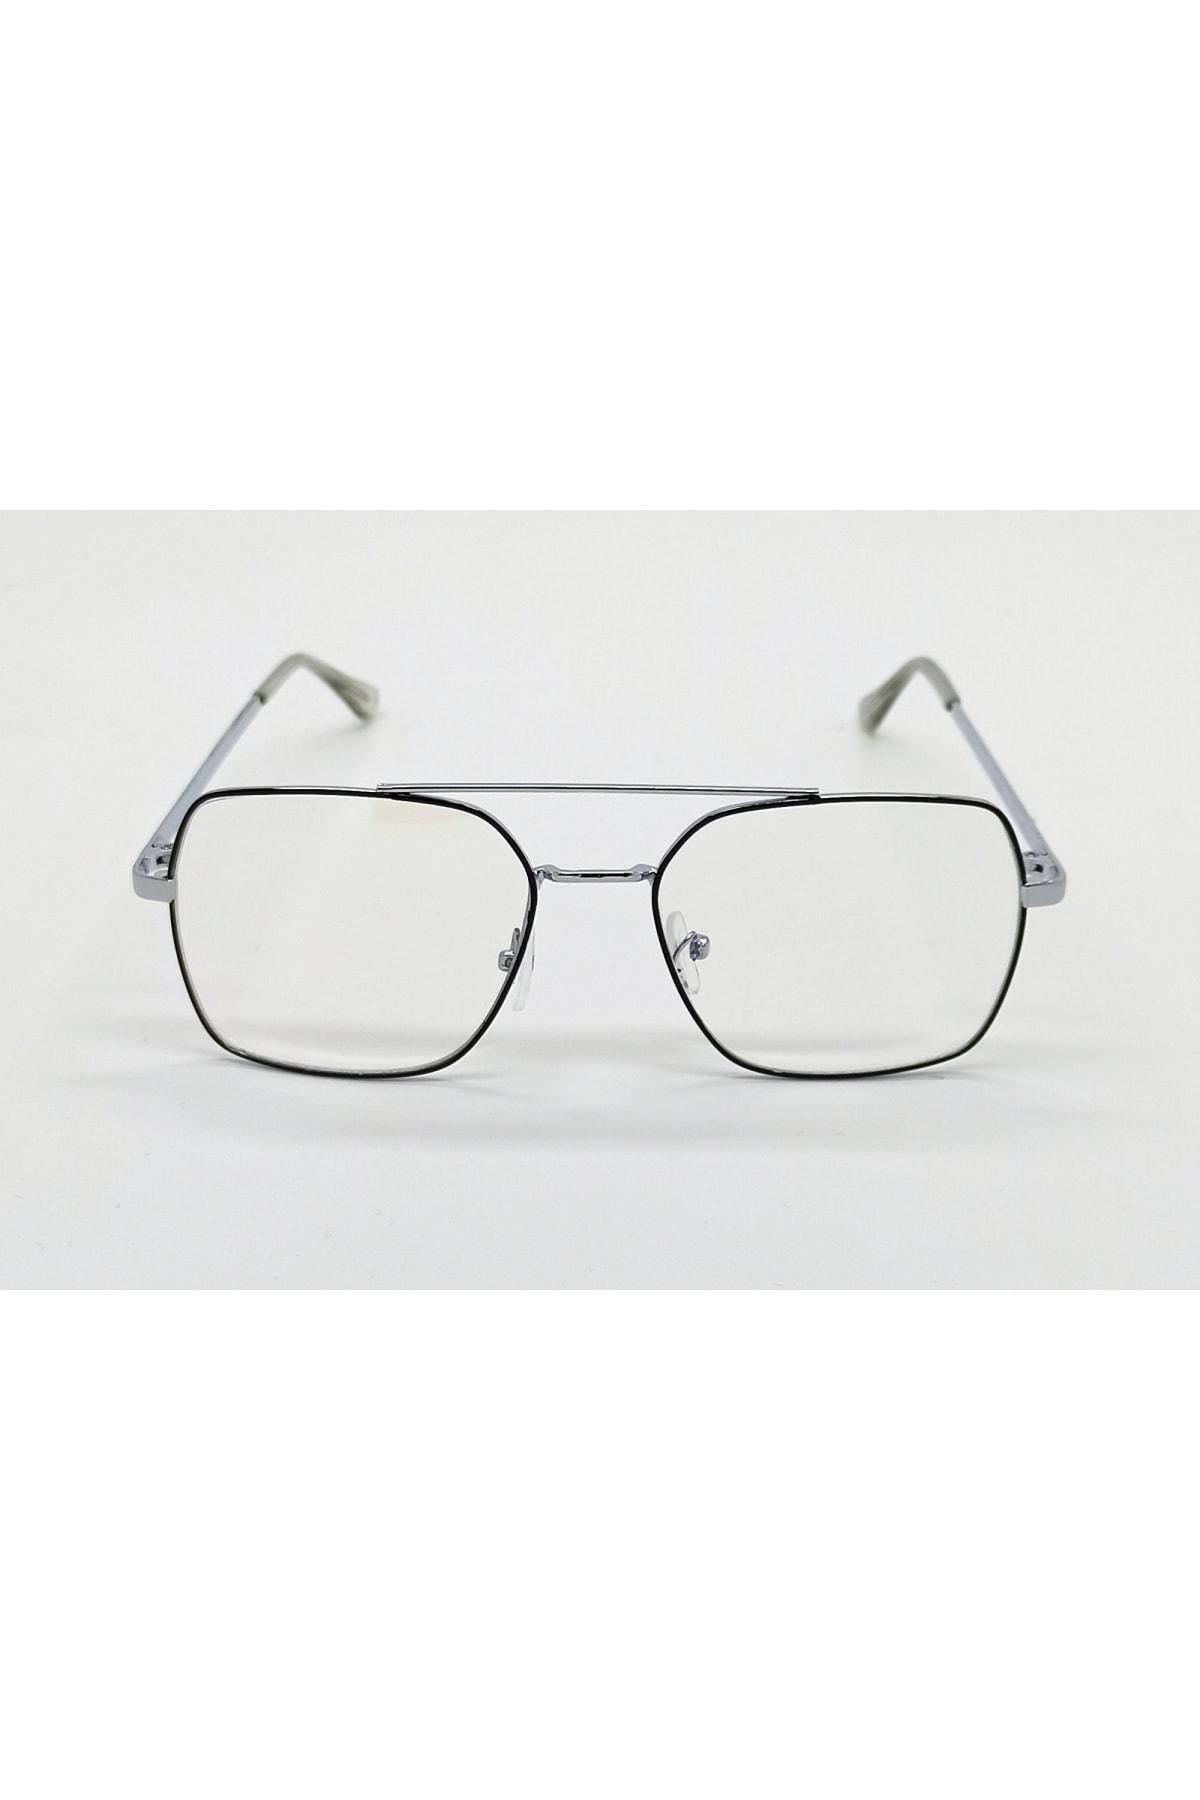 Reymen Dikdörtgen Gözlük